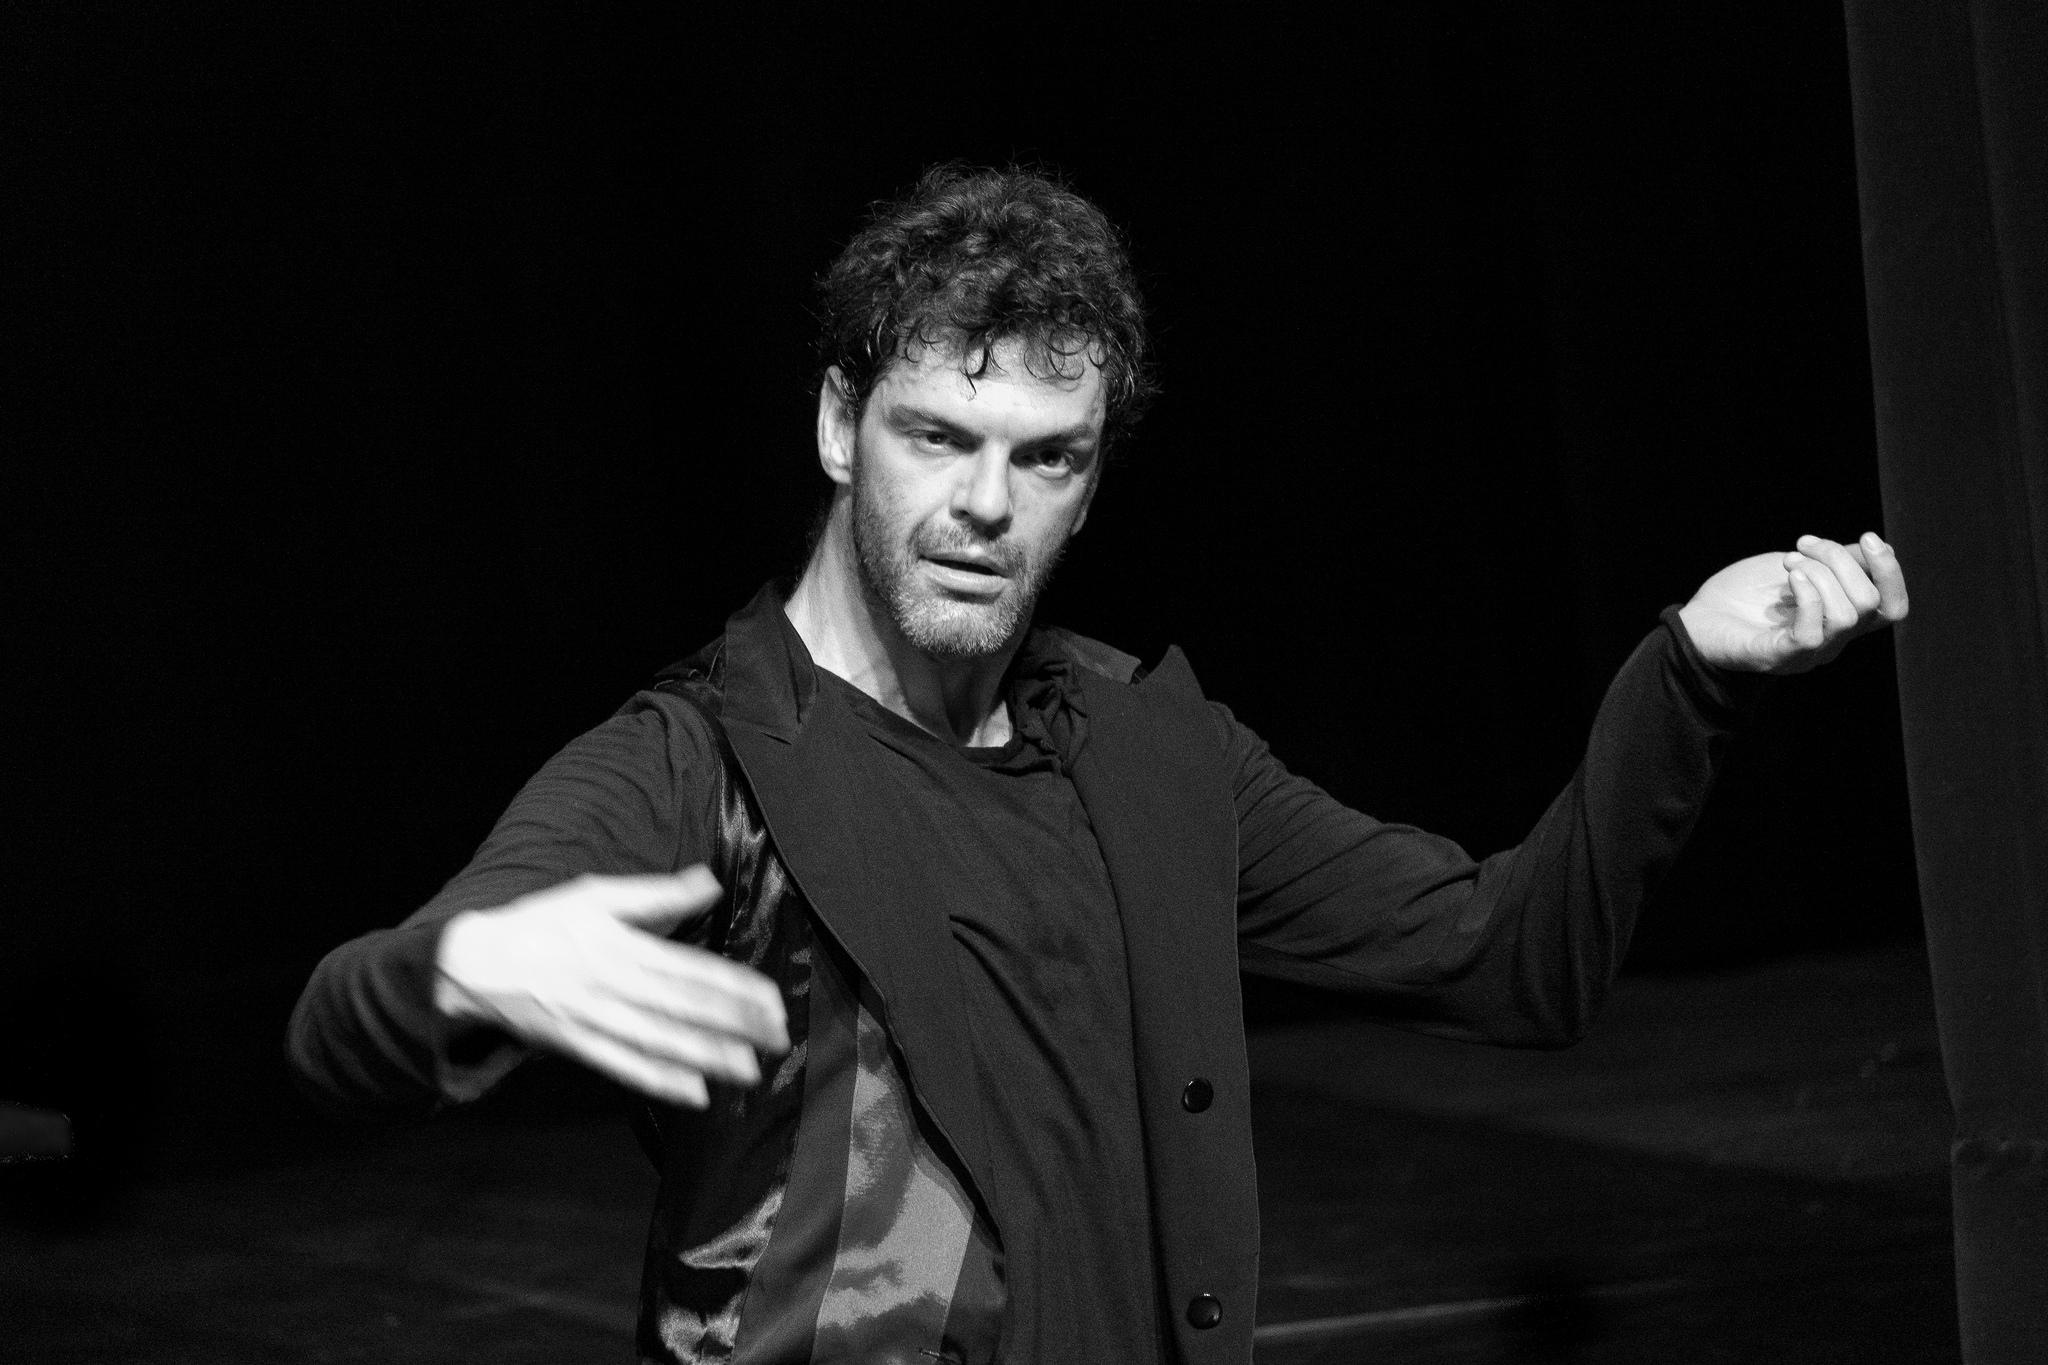 Krisztian Gergye (tanec) (Mad'arsko